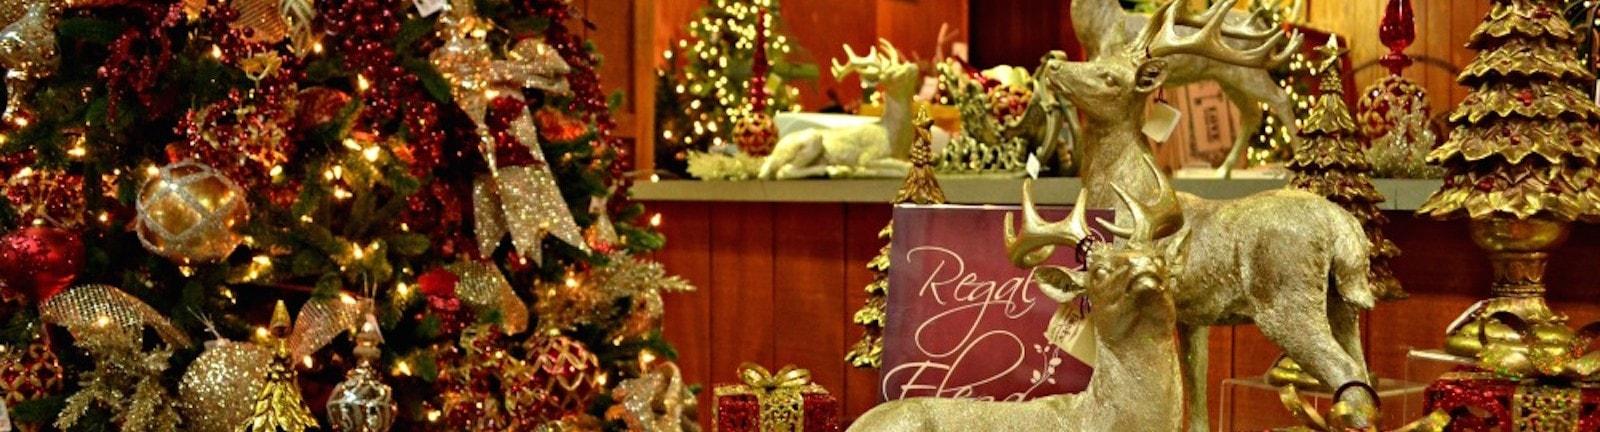 Gift shop raleigh nc garden gifts nc home decor - Home decor stores raleigh nc model ...